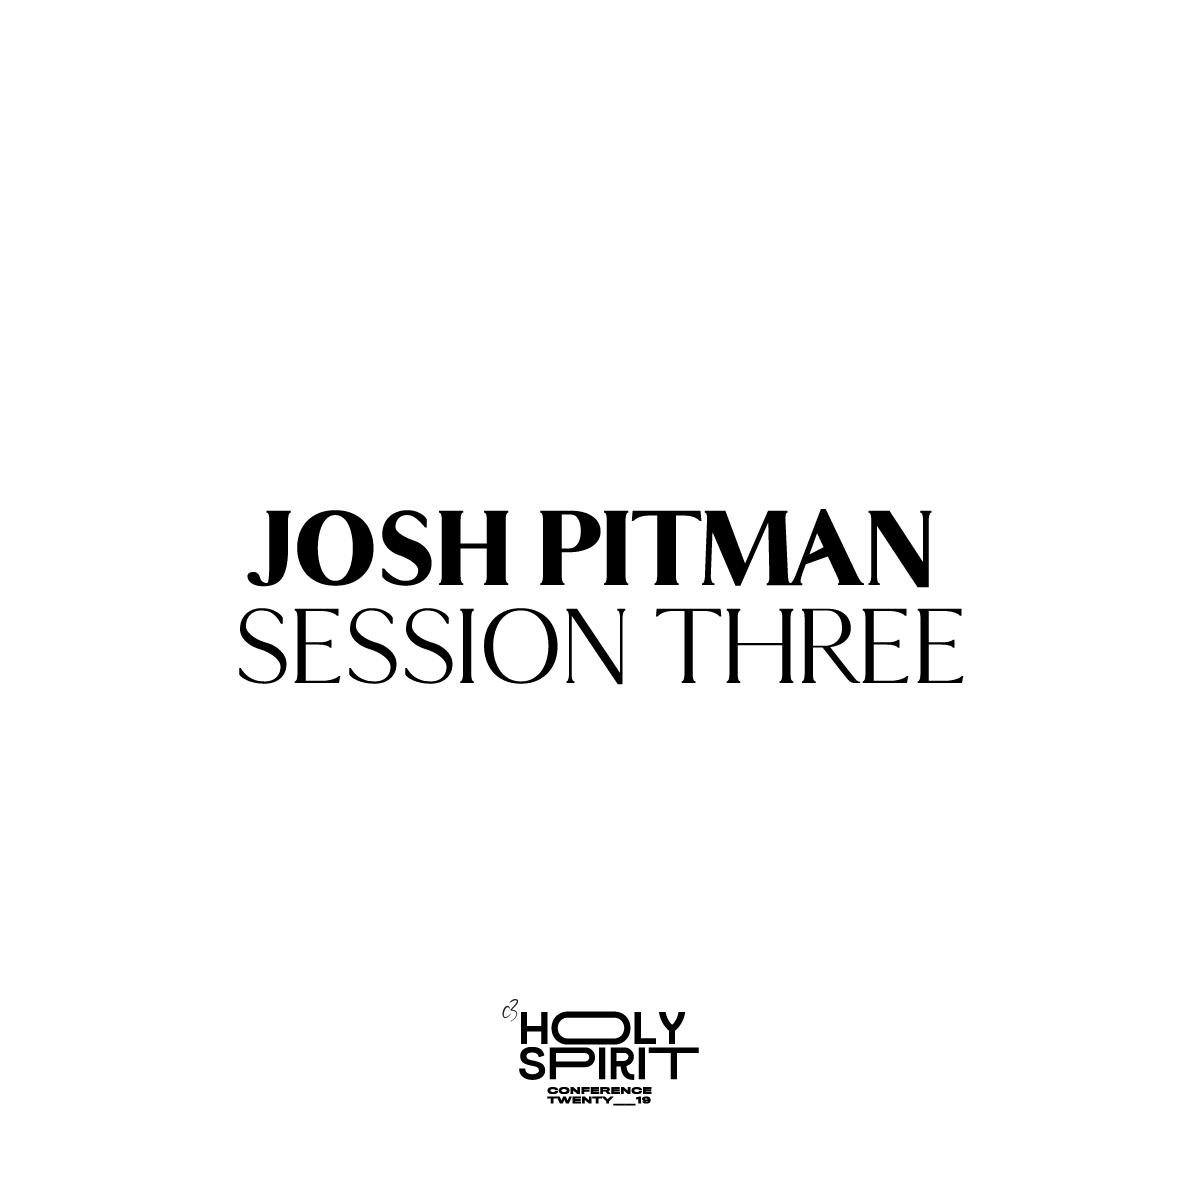 Session 3 - Josh Pitman